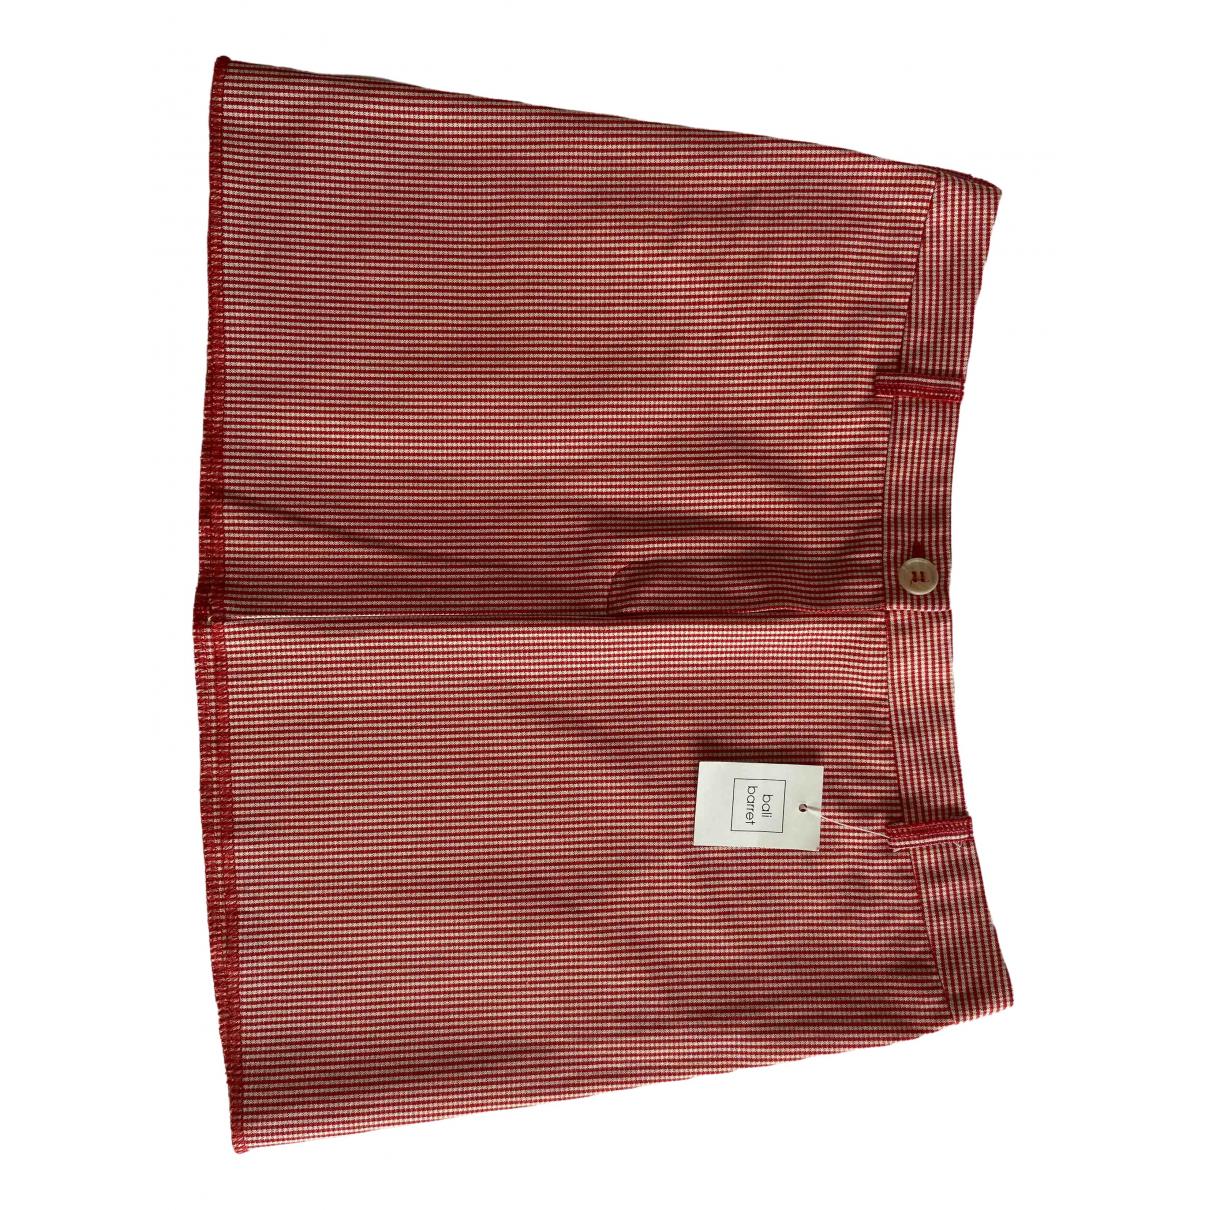 Bali Barret \N Red Cotton skirt for Women 36 FR